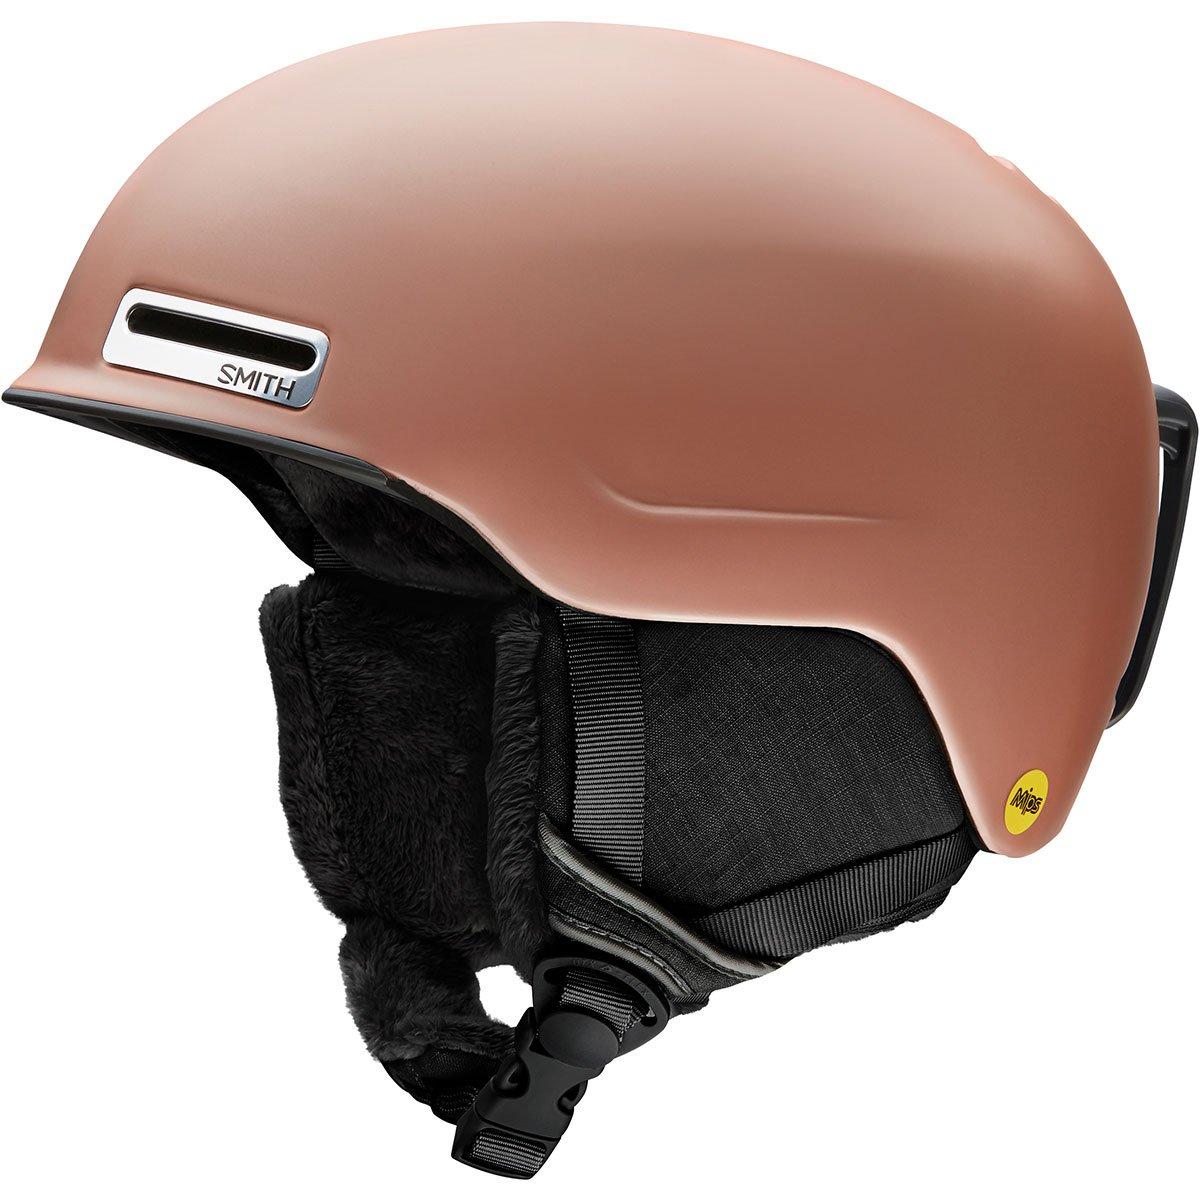 Smith Optics Allure Women's Ski Snowmobile Helmet - Matte Champagne/Medium